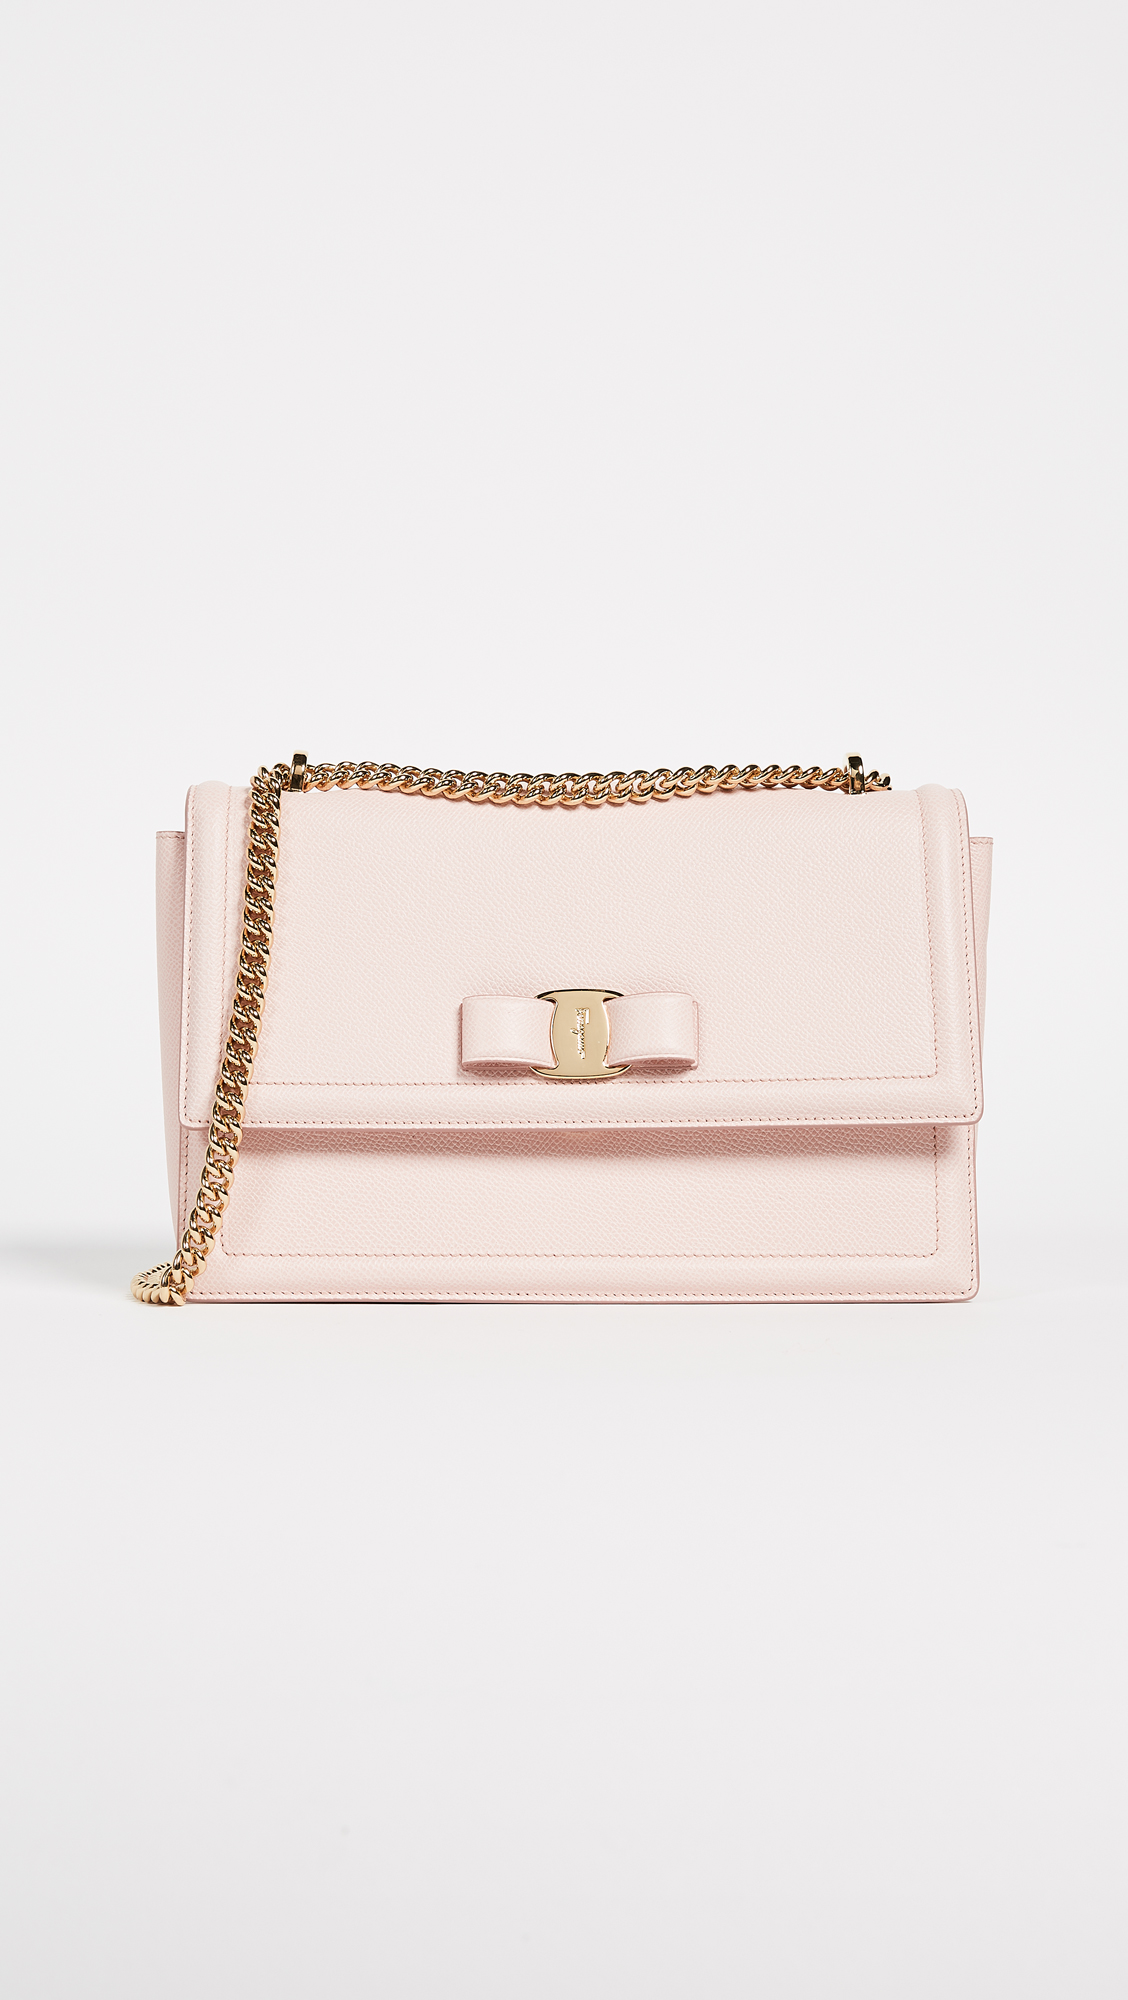 ff6404c21b5b Salvatore Ferragamo Ginny Shoulder Bag